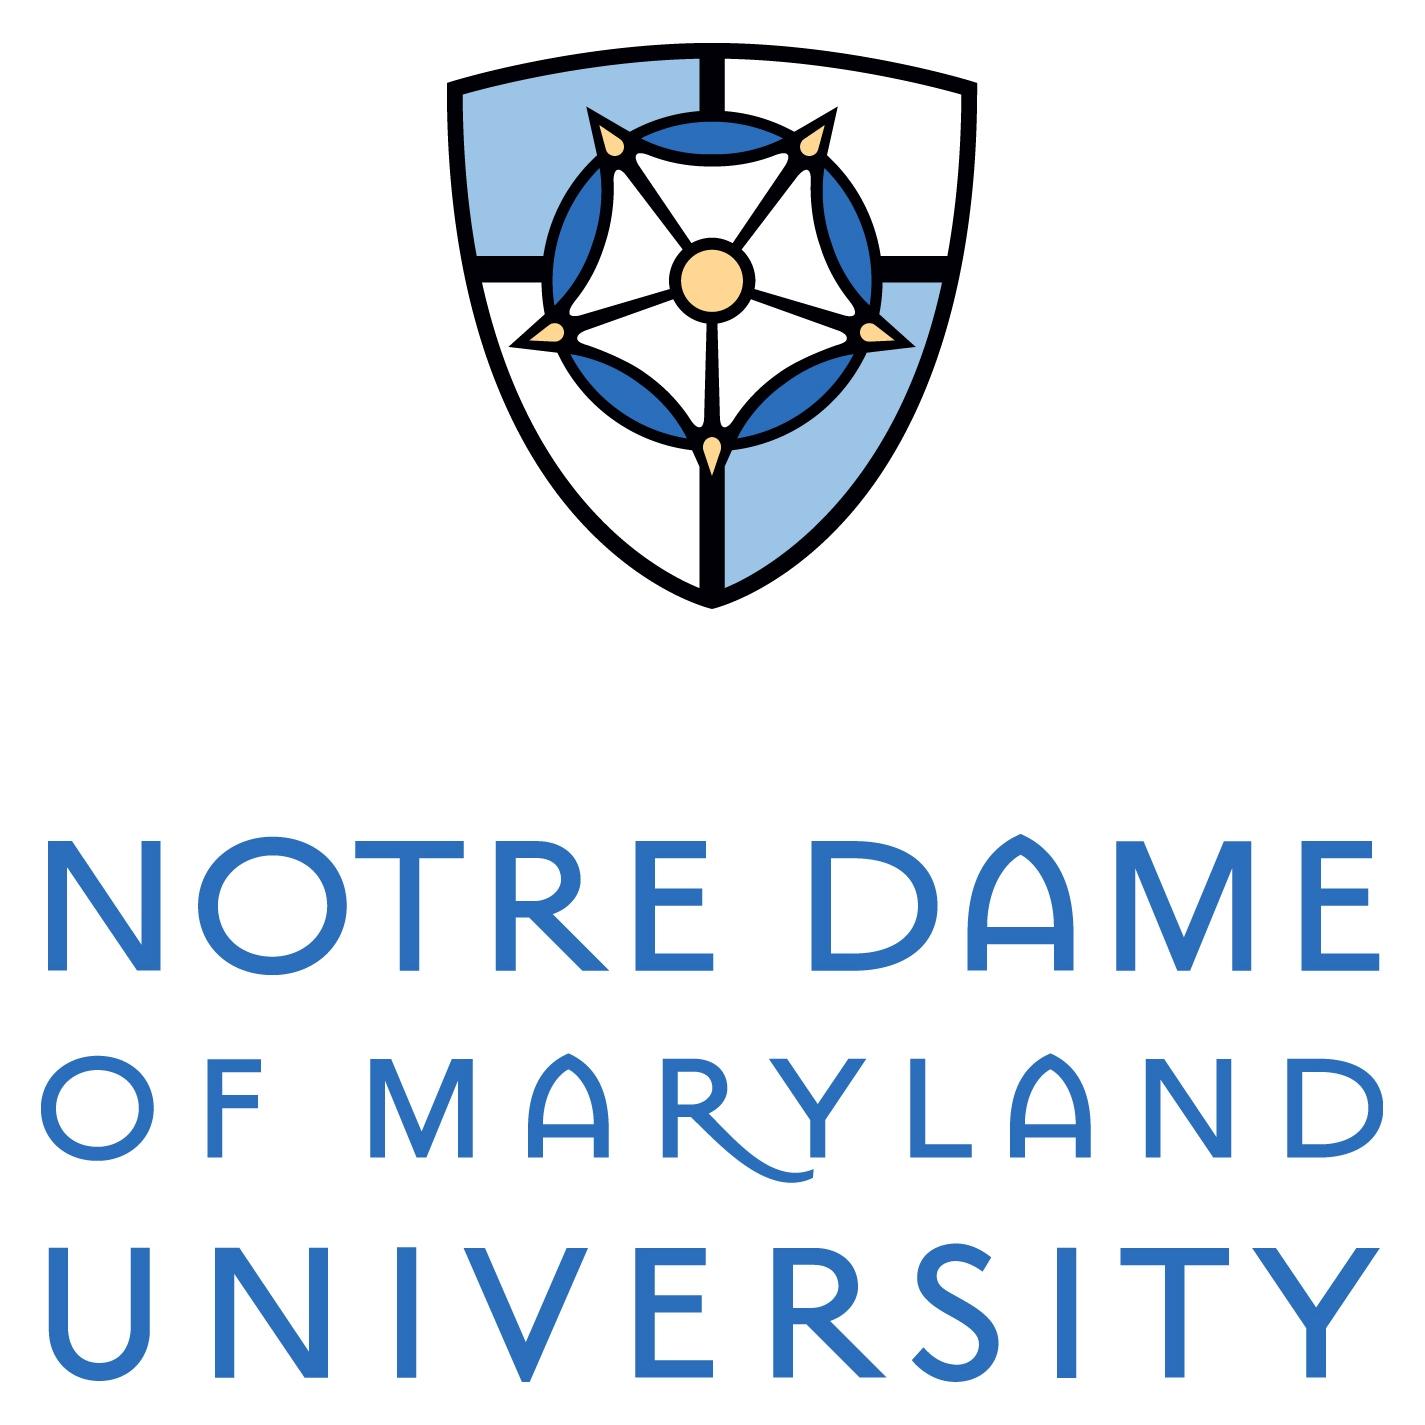 Notre Dame of MD University RN to BSN nursing school